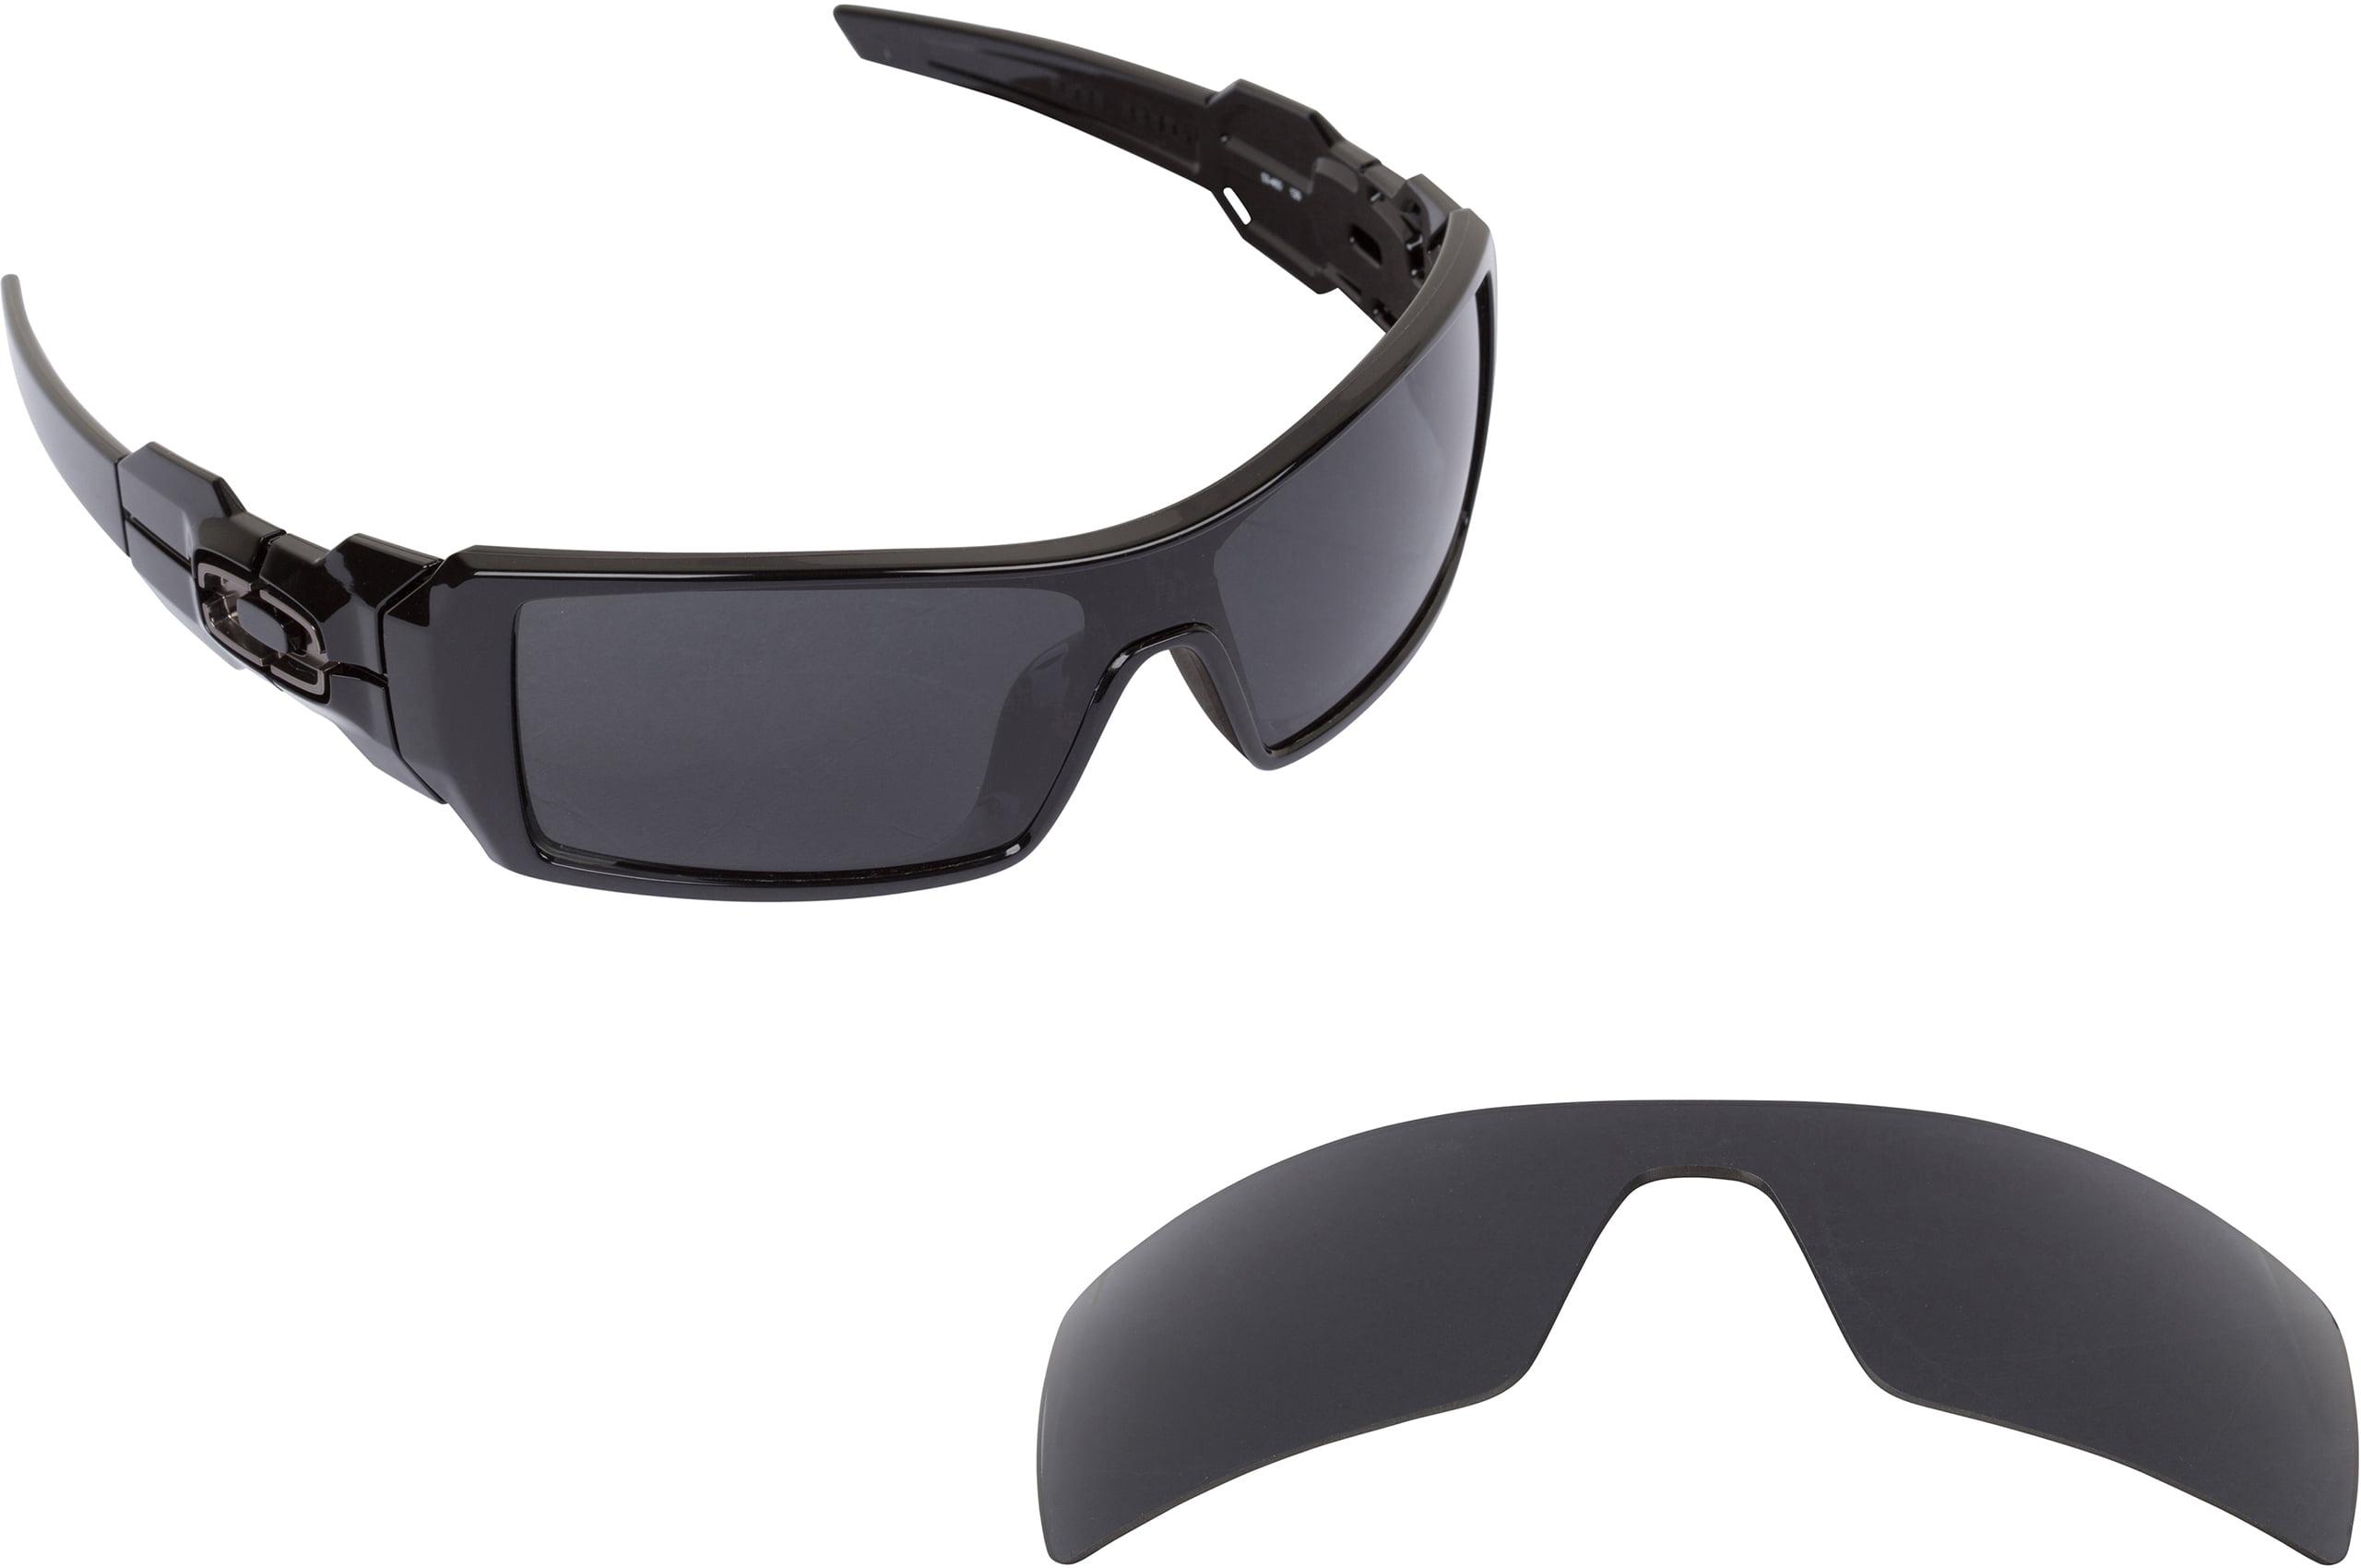 ac531d109f ... uk best seek replacement lenses for oakley sunglasses oil rig multiple  options 3dbde ccb58